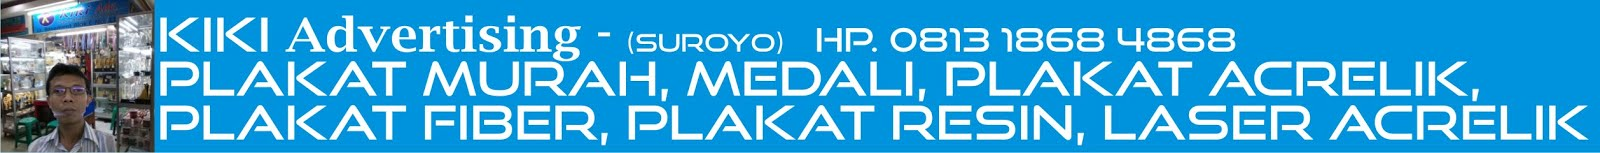 KIKI Adv.- Plakat Murah, Medali, Plakat Akrilik, Plakat Fiber, Plakat Resin